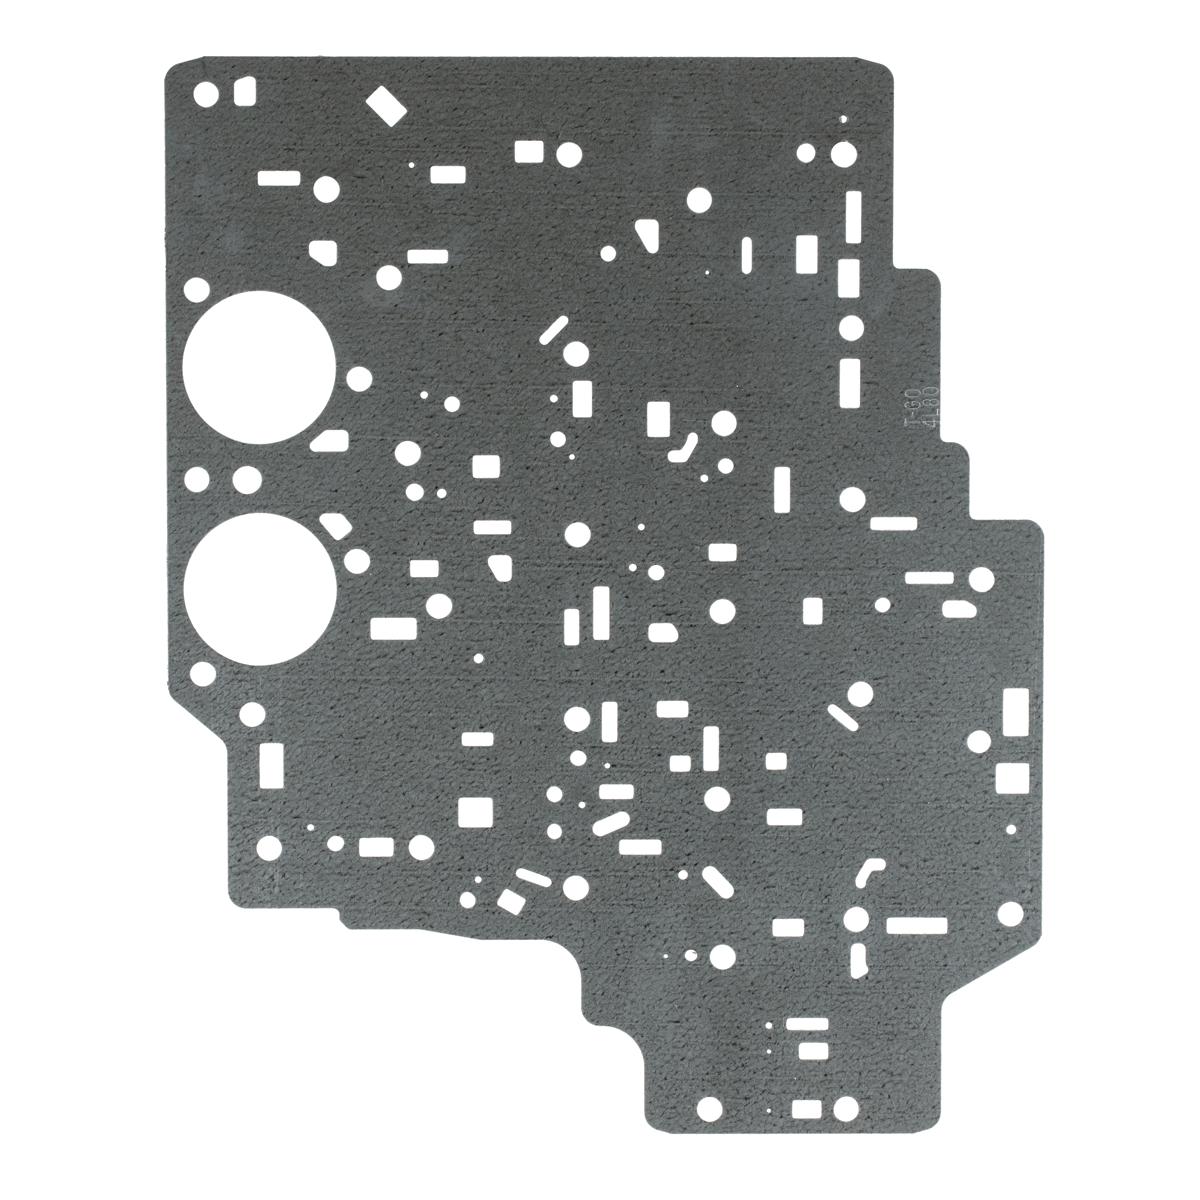 4l80 separator plate